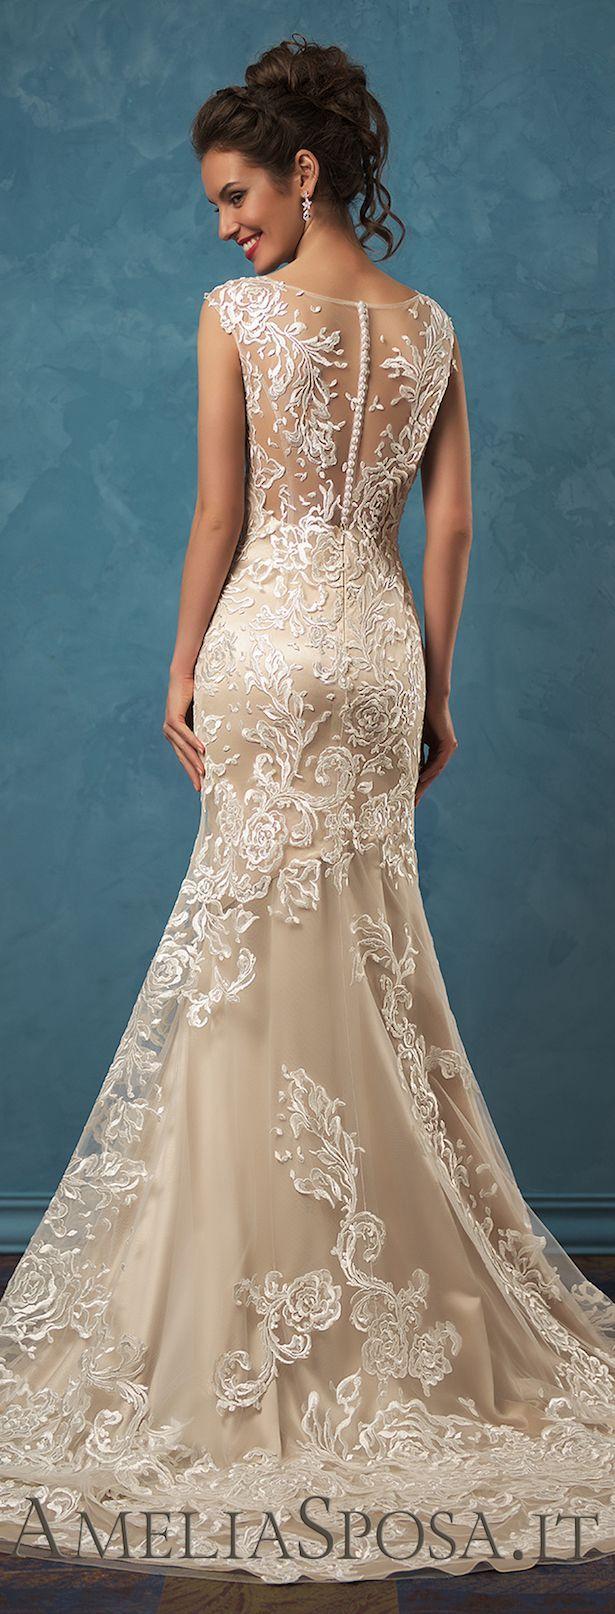 Wedding Dresses Paradise - Amelia Sposa 2017 Wedding Dress